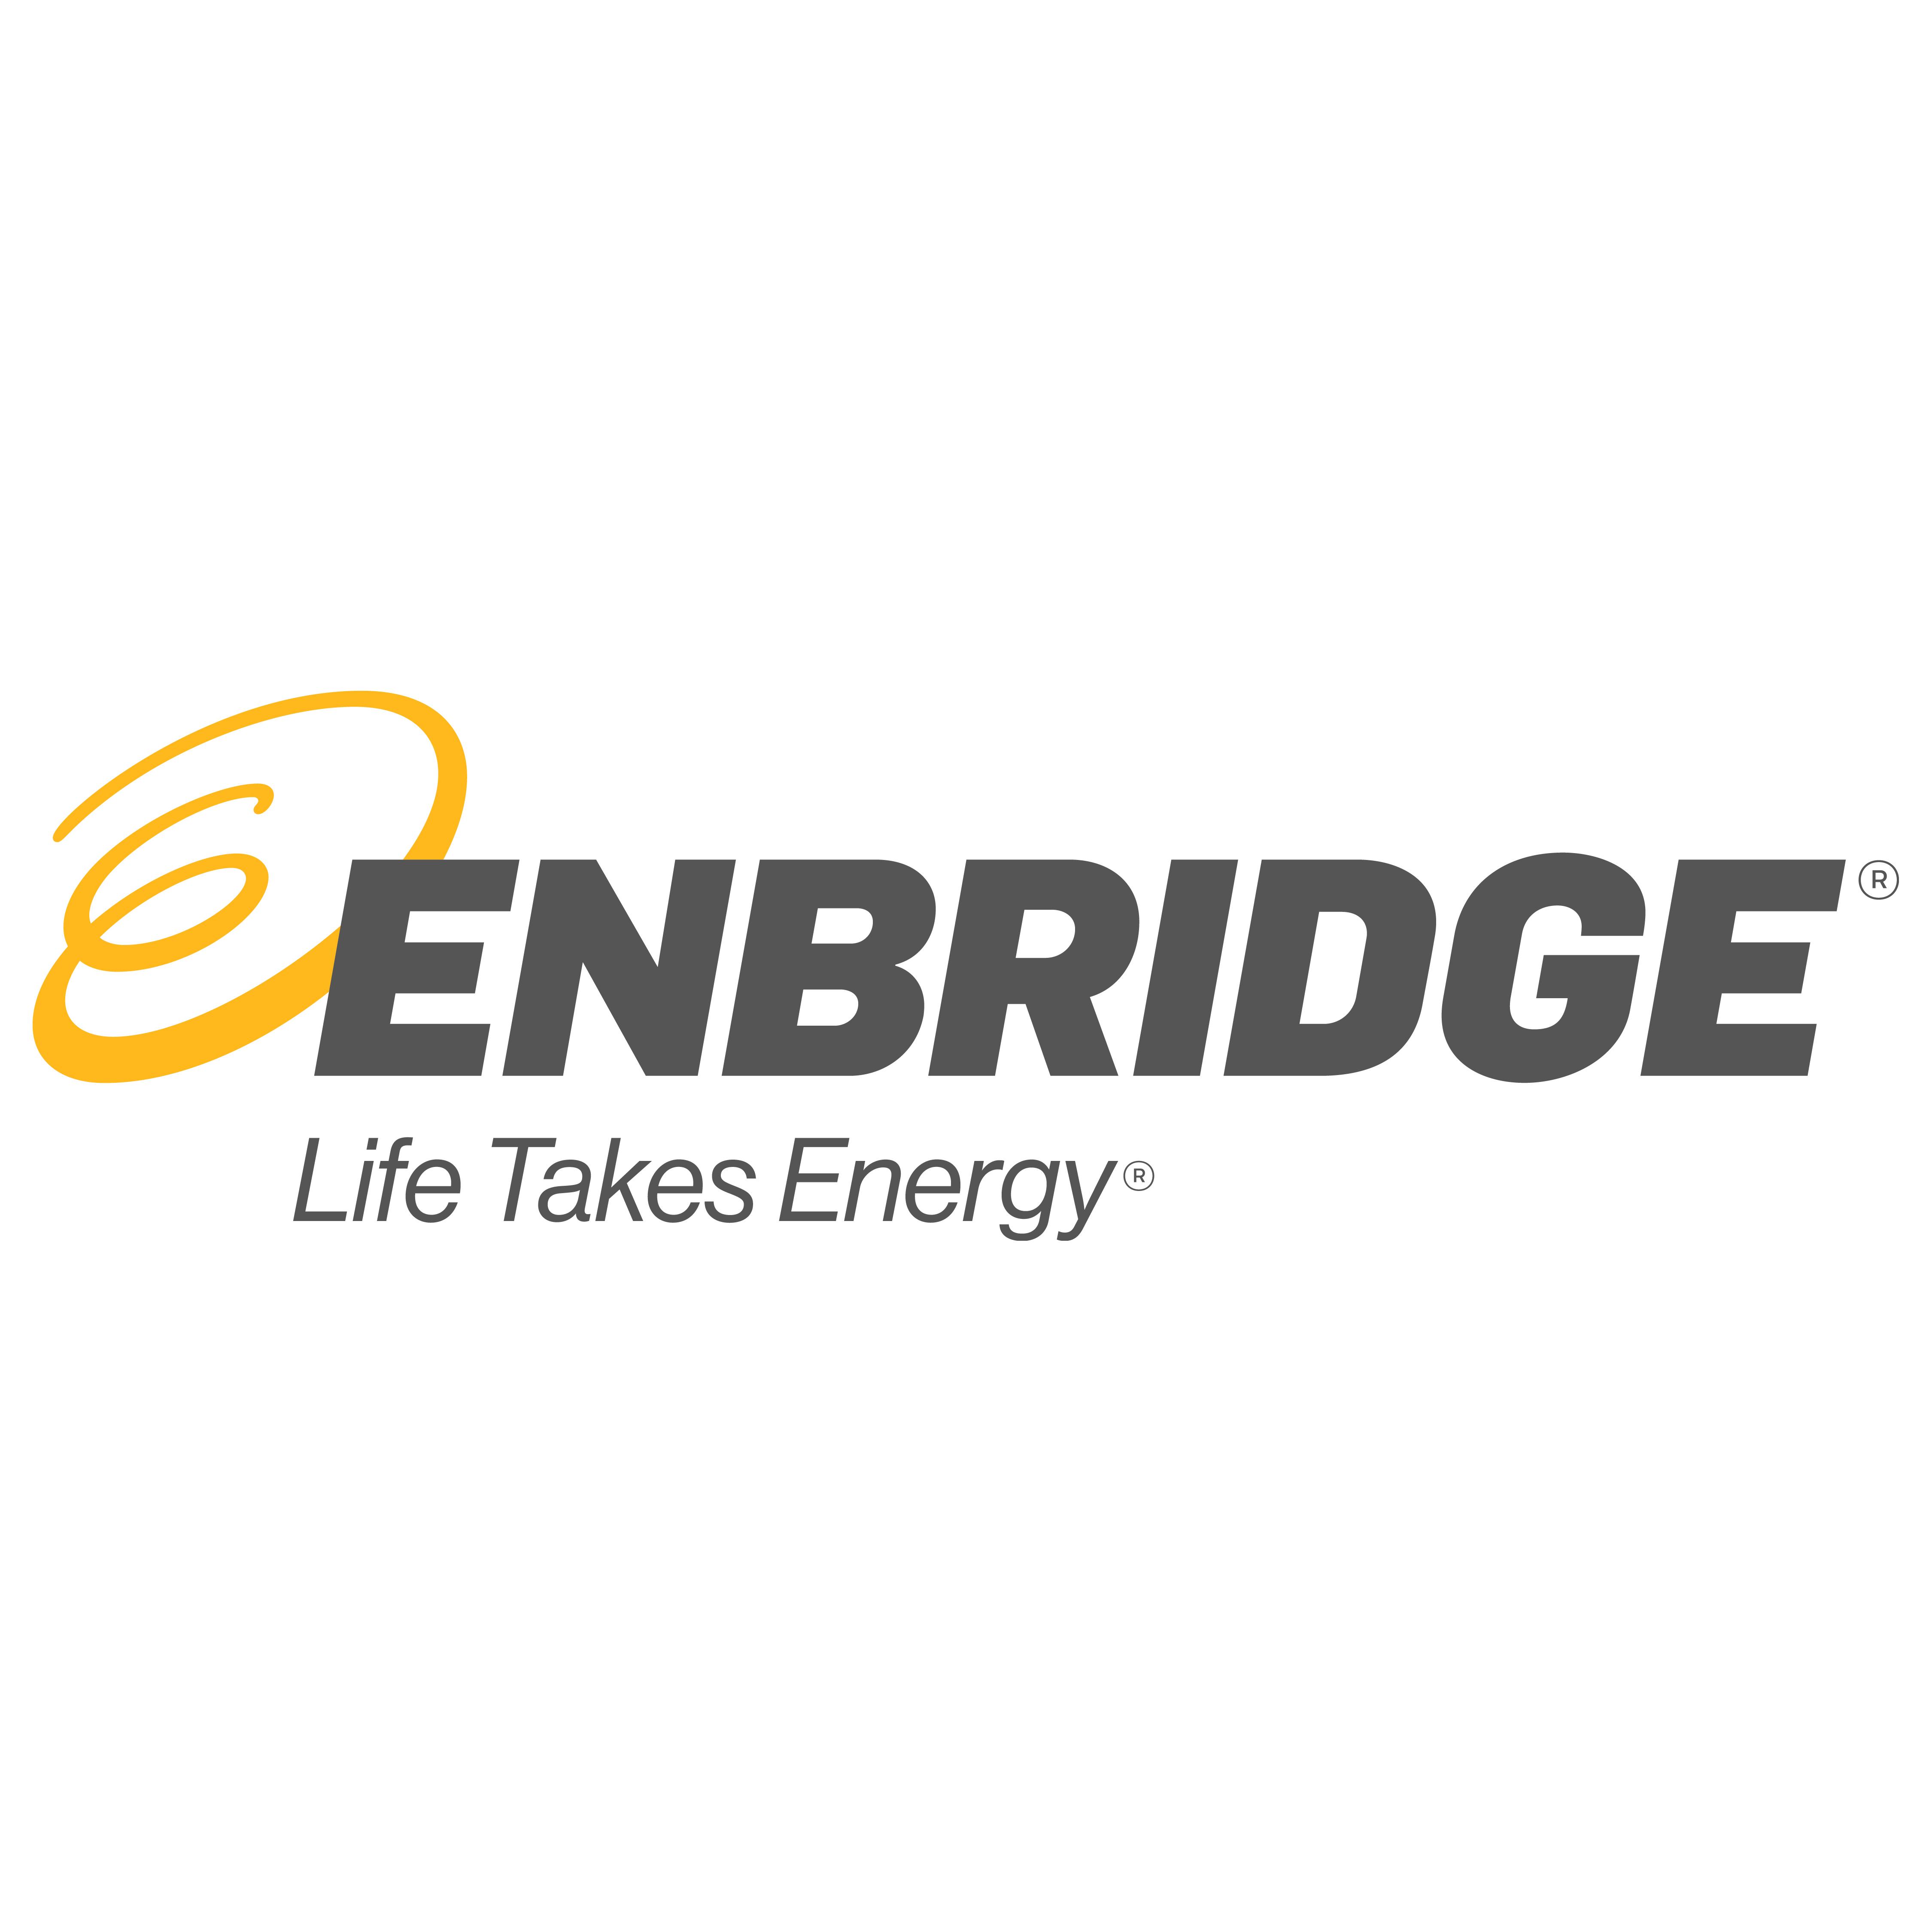 Enbridge